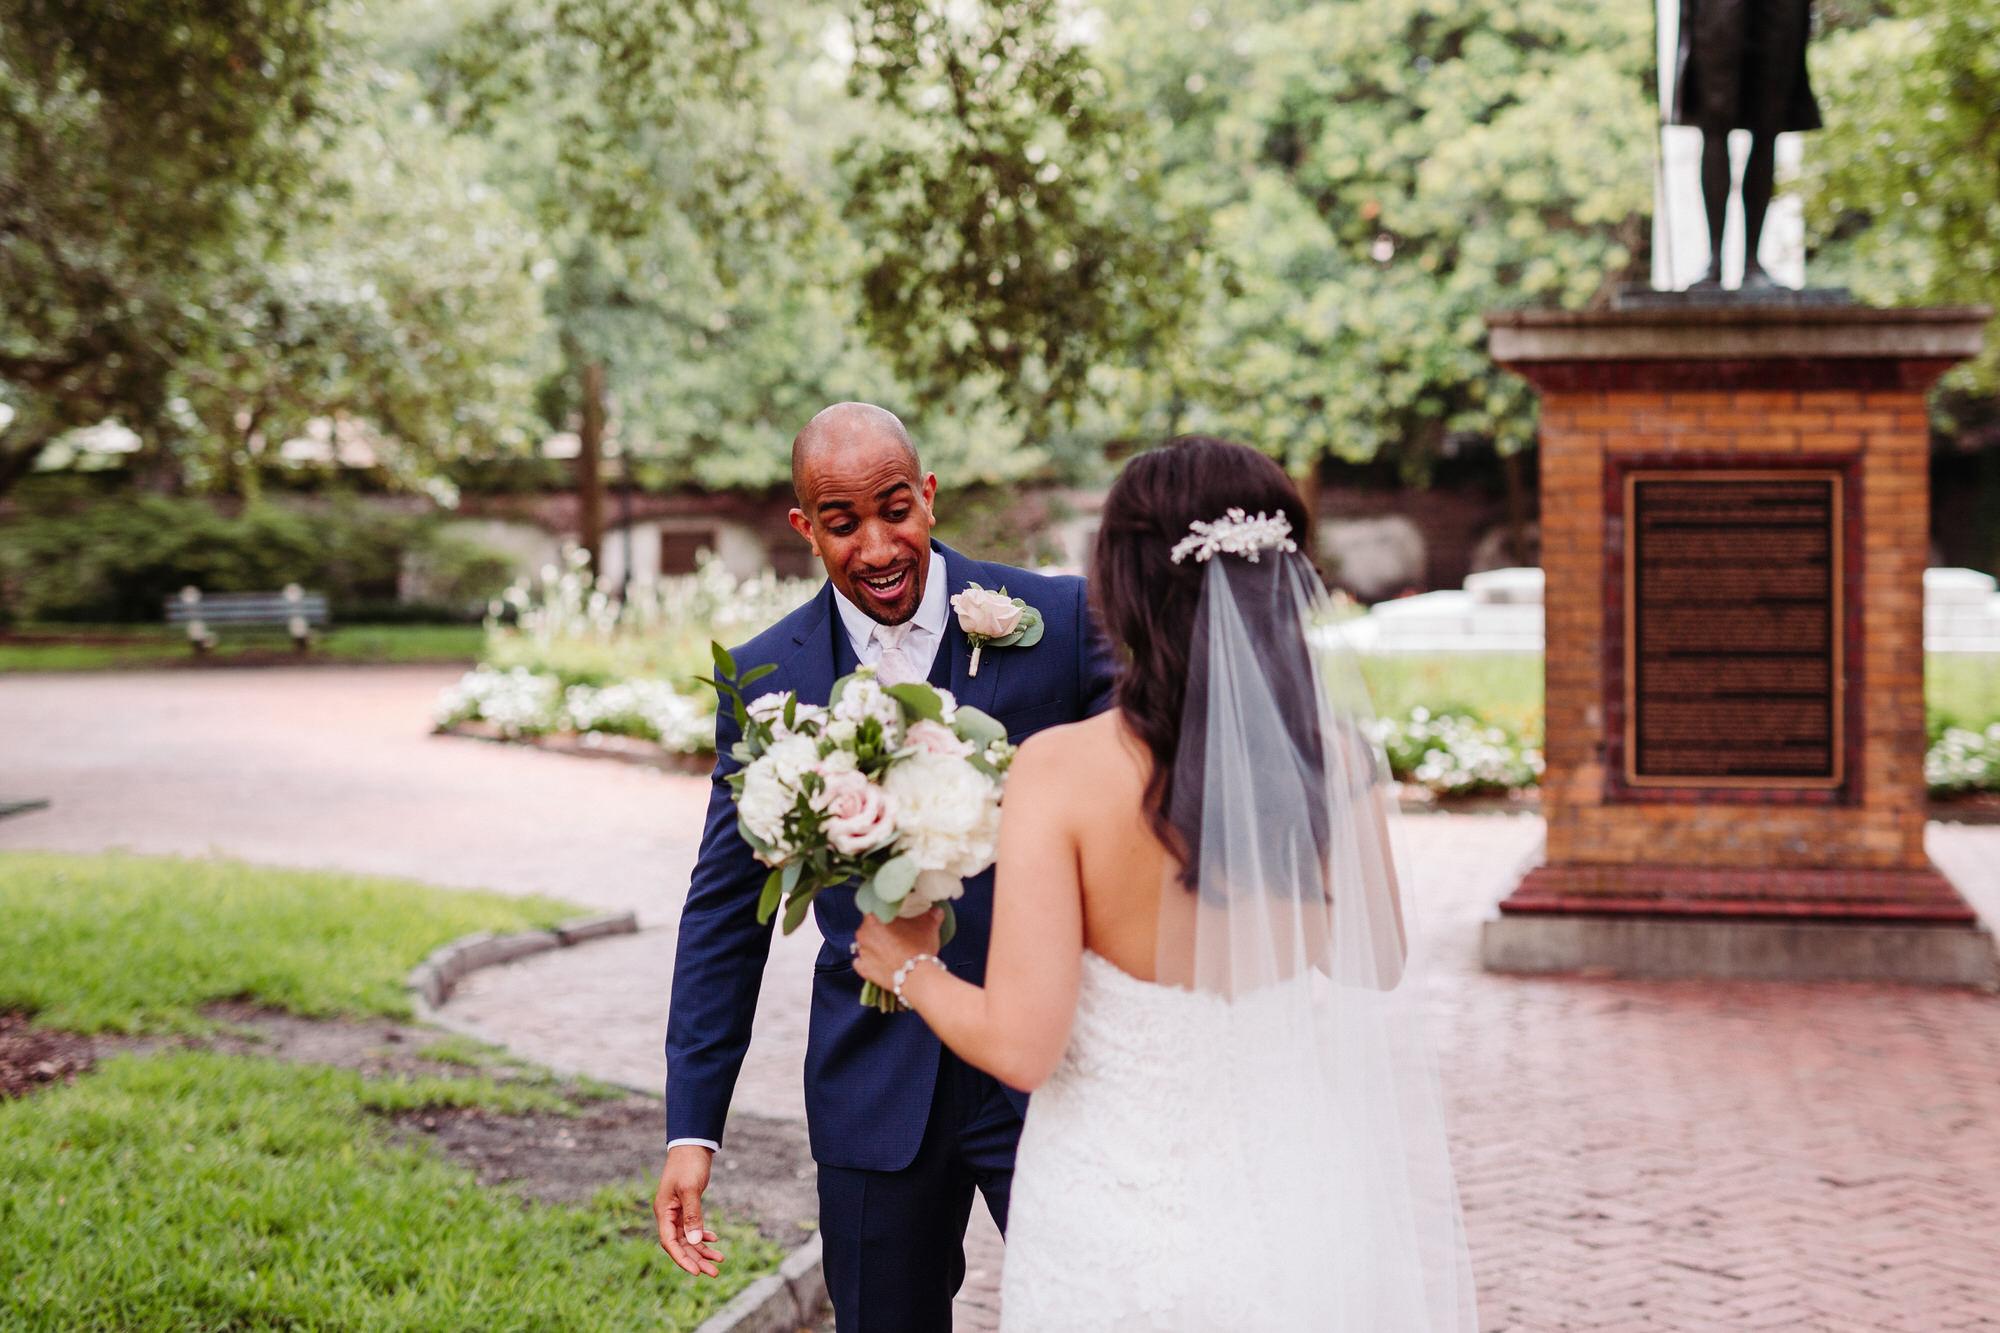 st-lukes-chapel-cannon-green-charleston-wedding-893.JPG